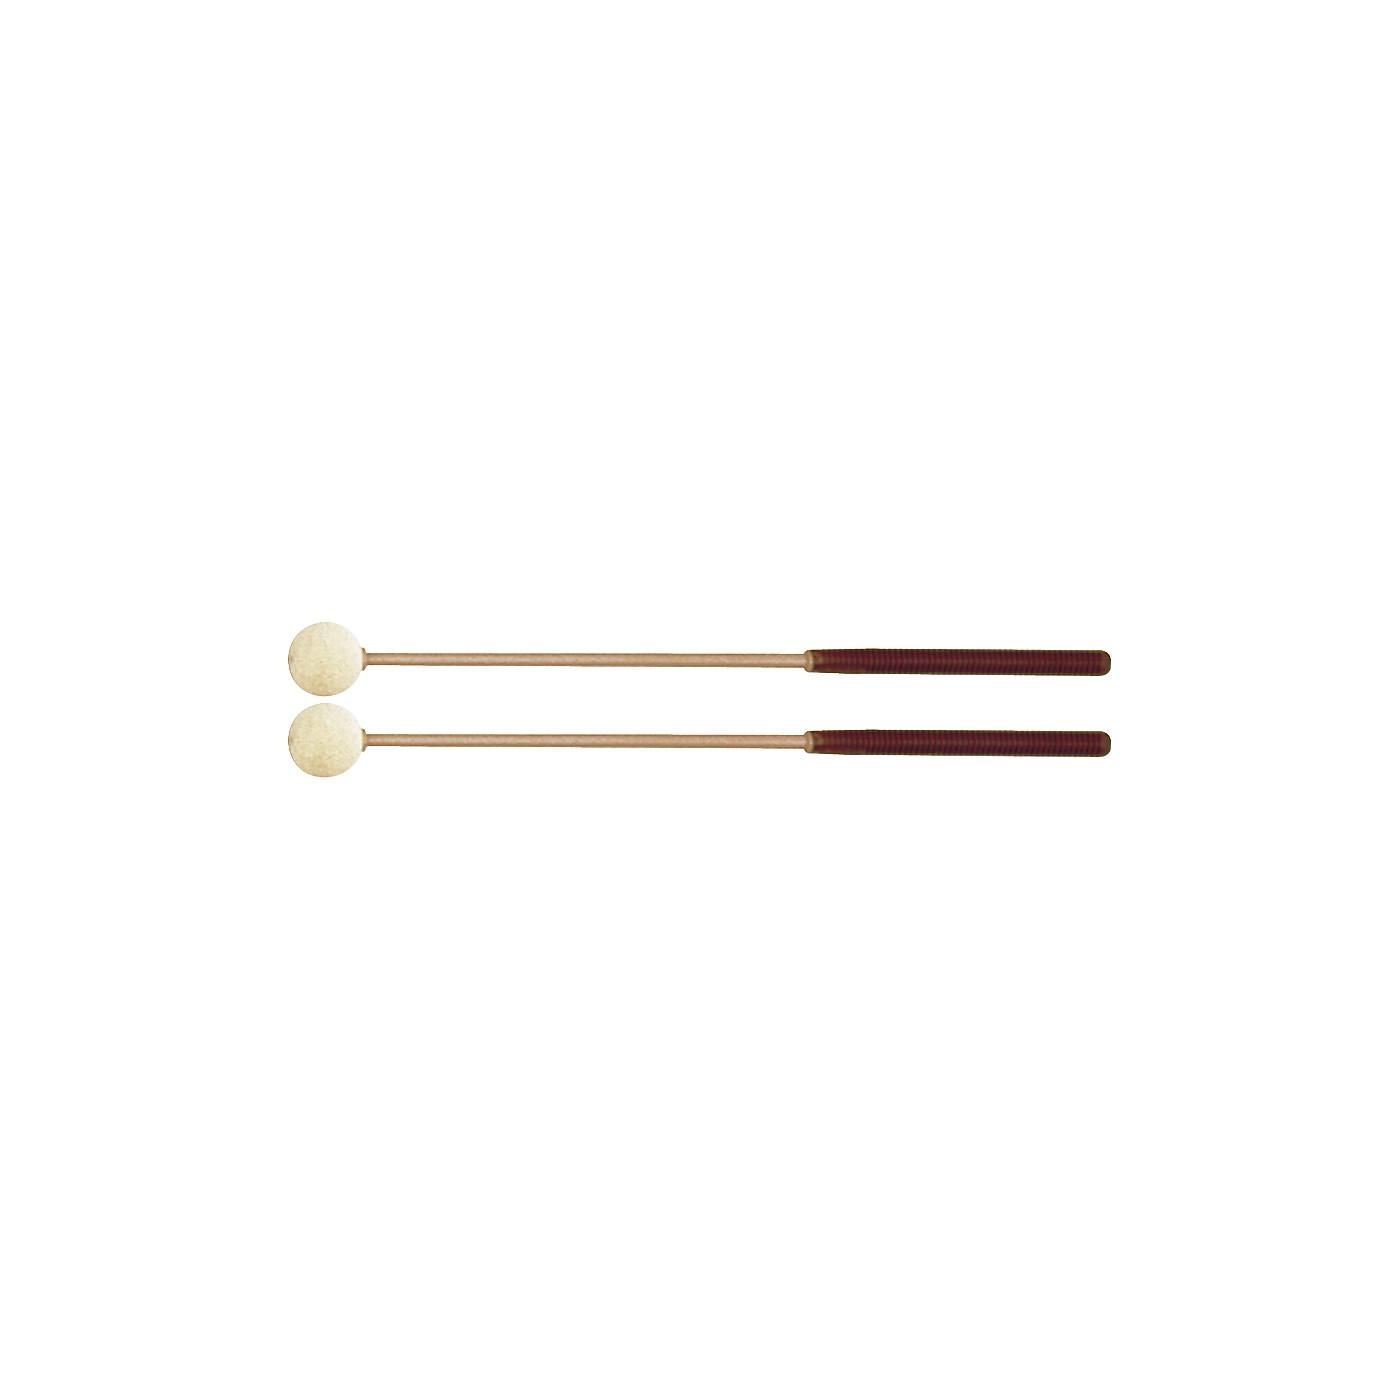 Studio 49 S4 Medium-Hard Felt Head Soprano/Alto Xylophone Mallets thumbnail